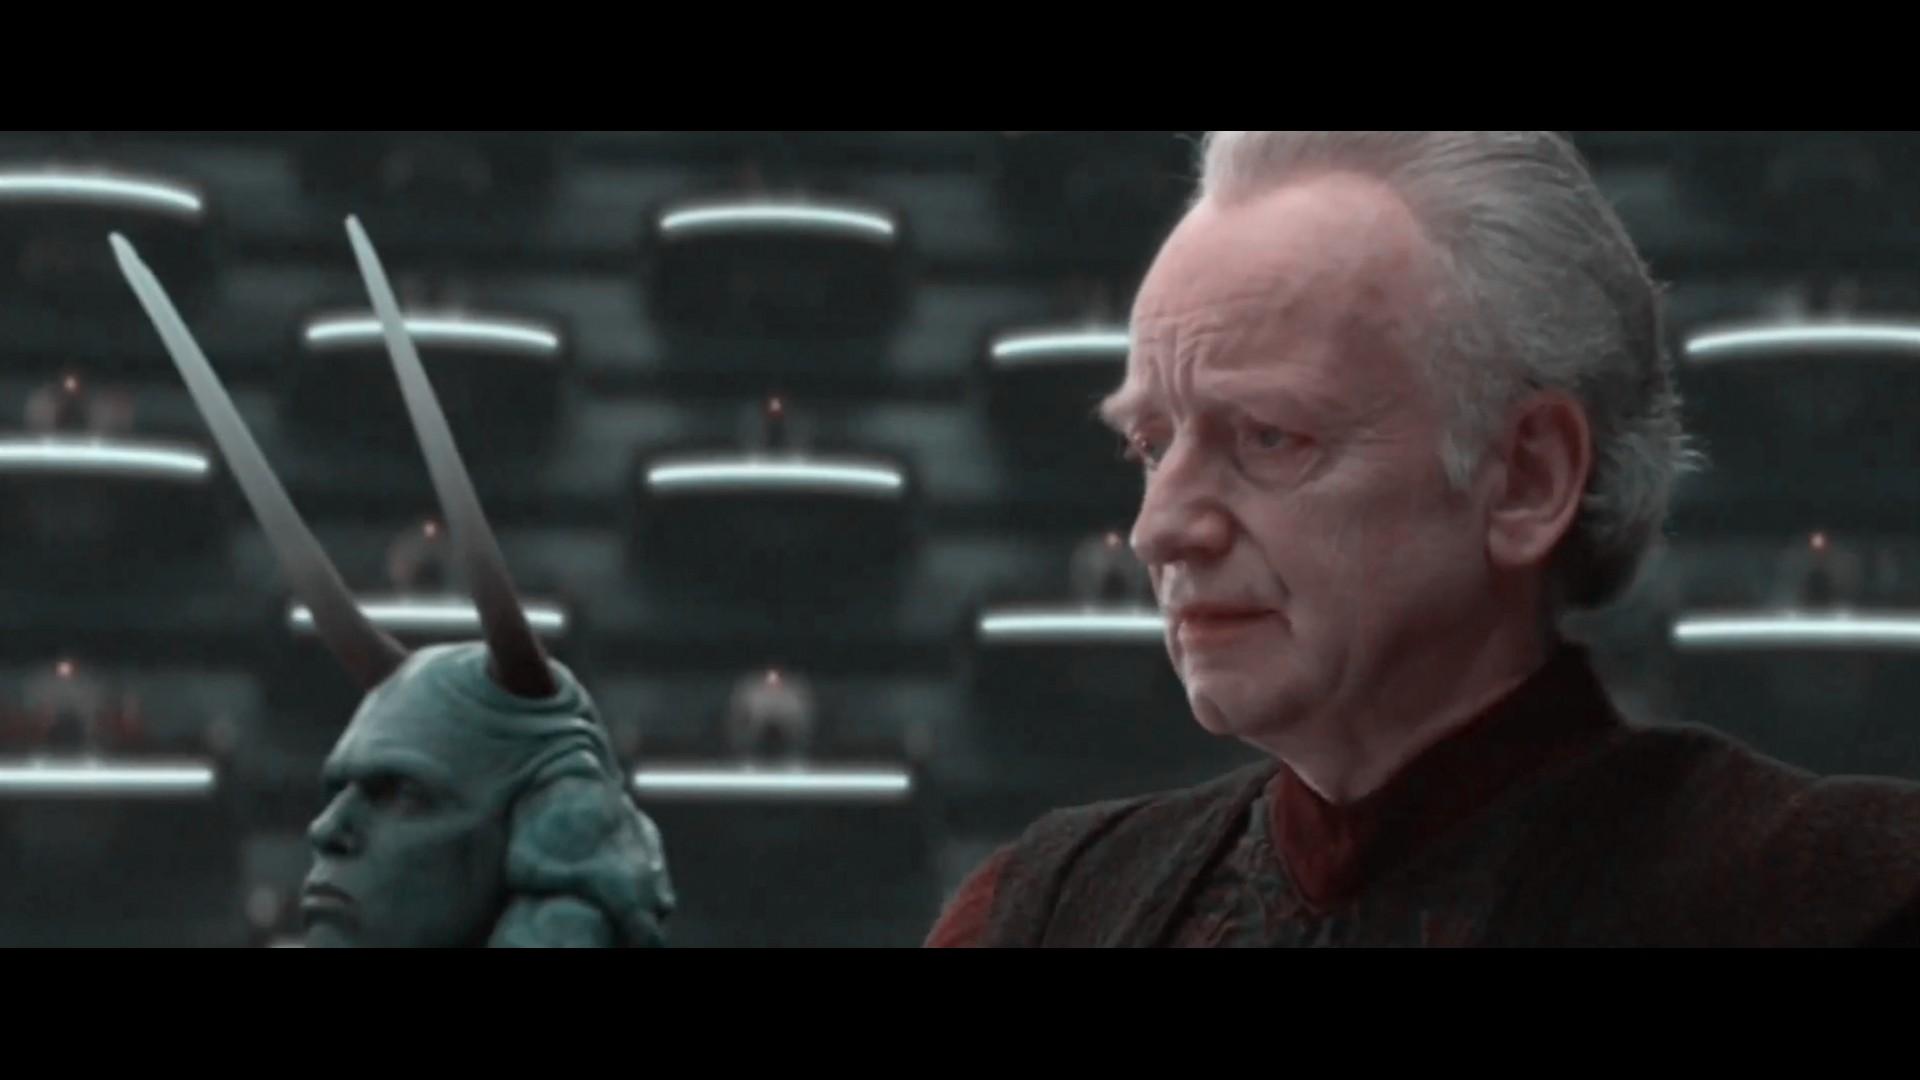 atine-in-star-wars-episode-ii-attack-of-the-clones.jpg